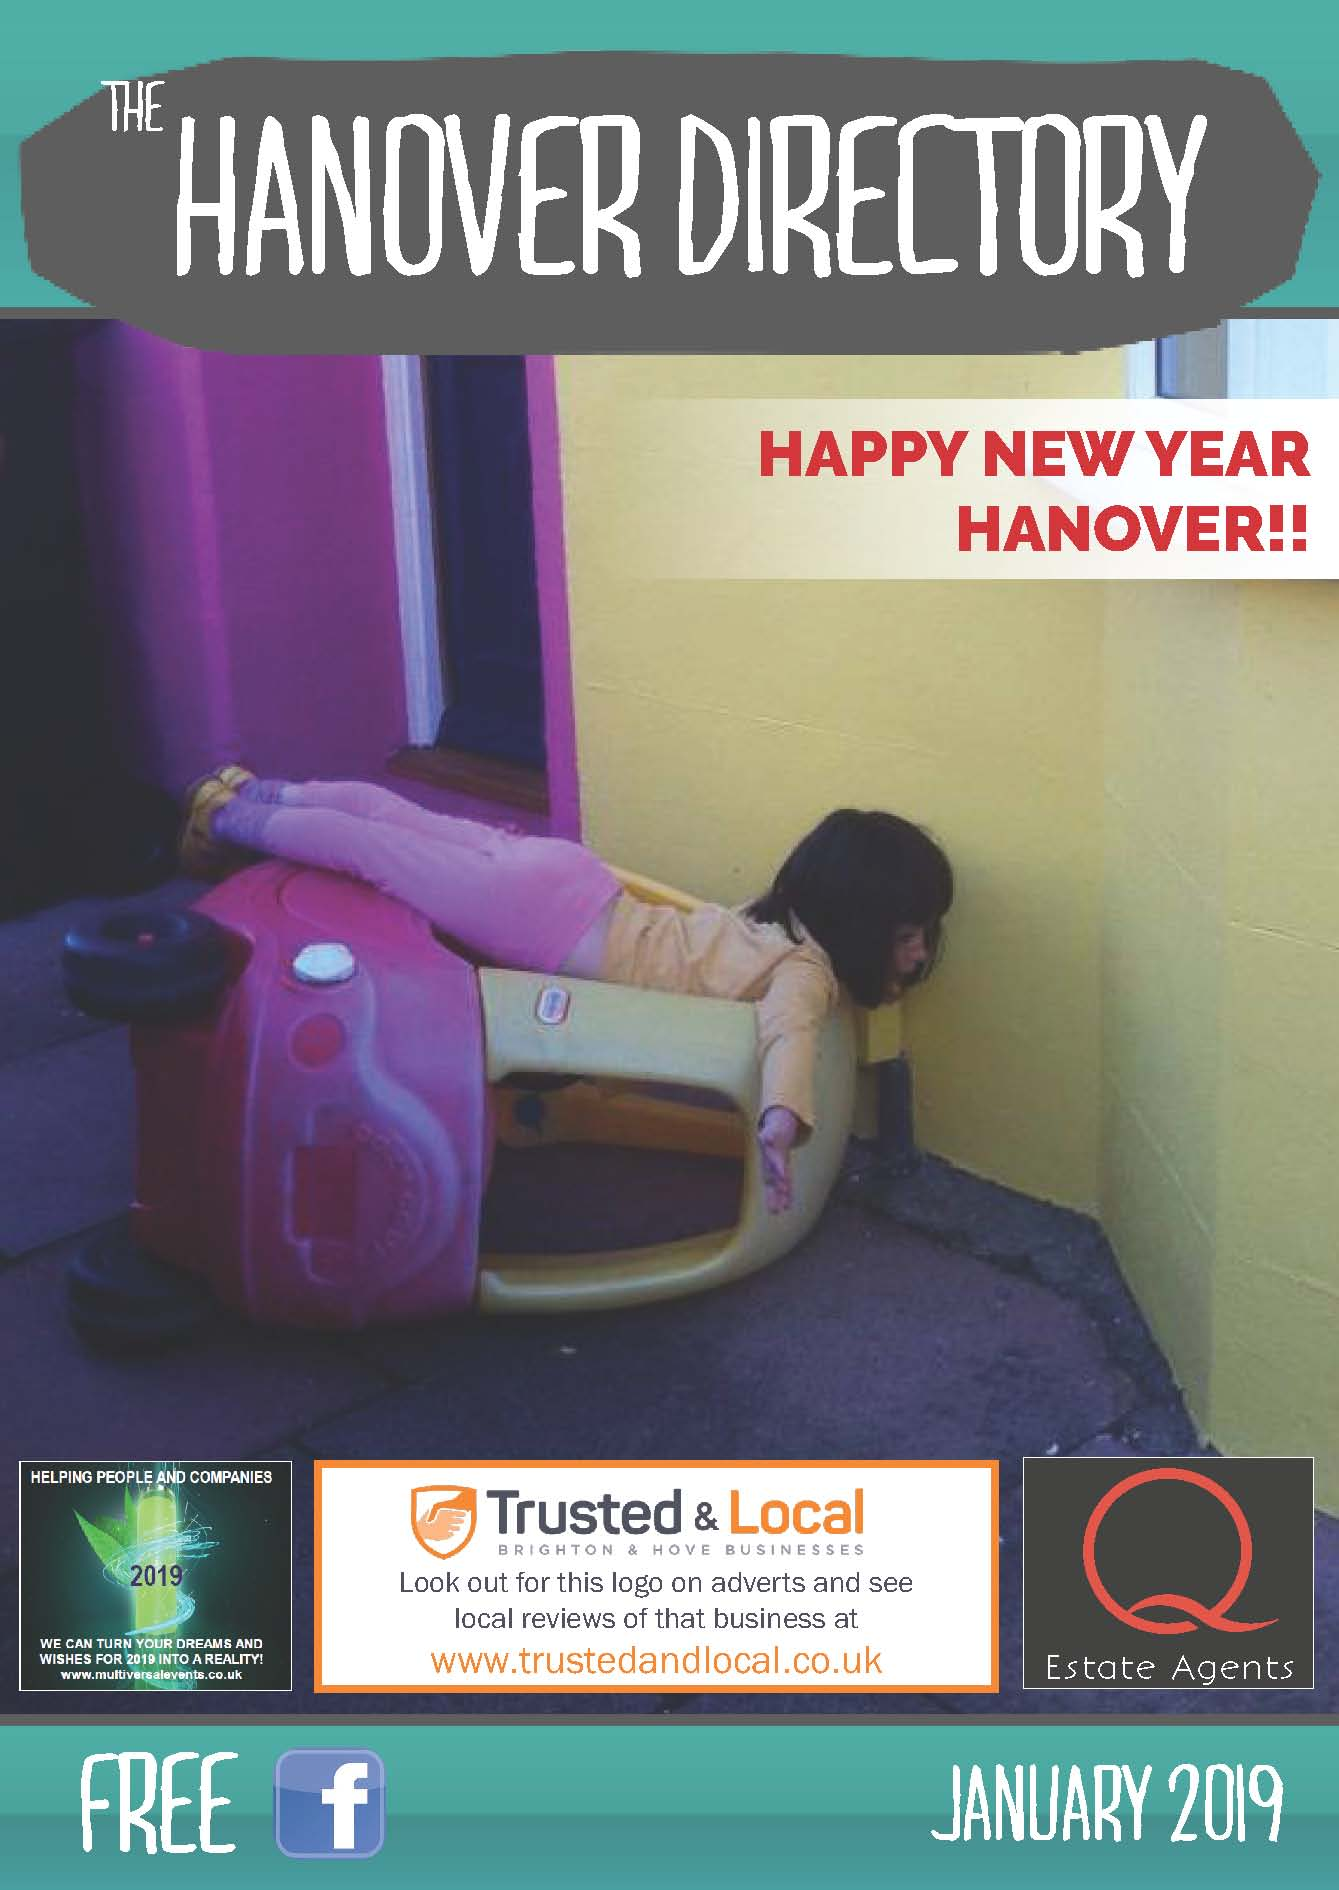 Hanover Directory